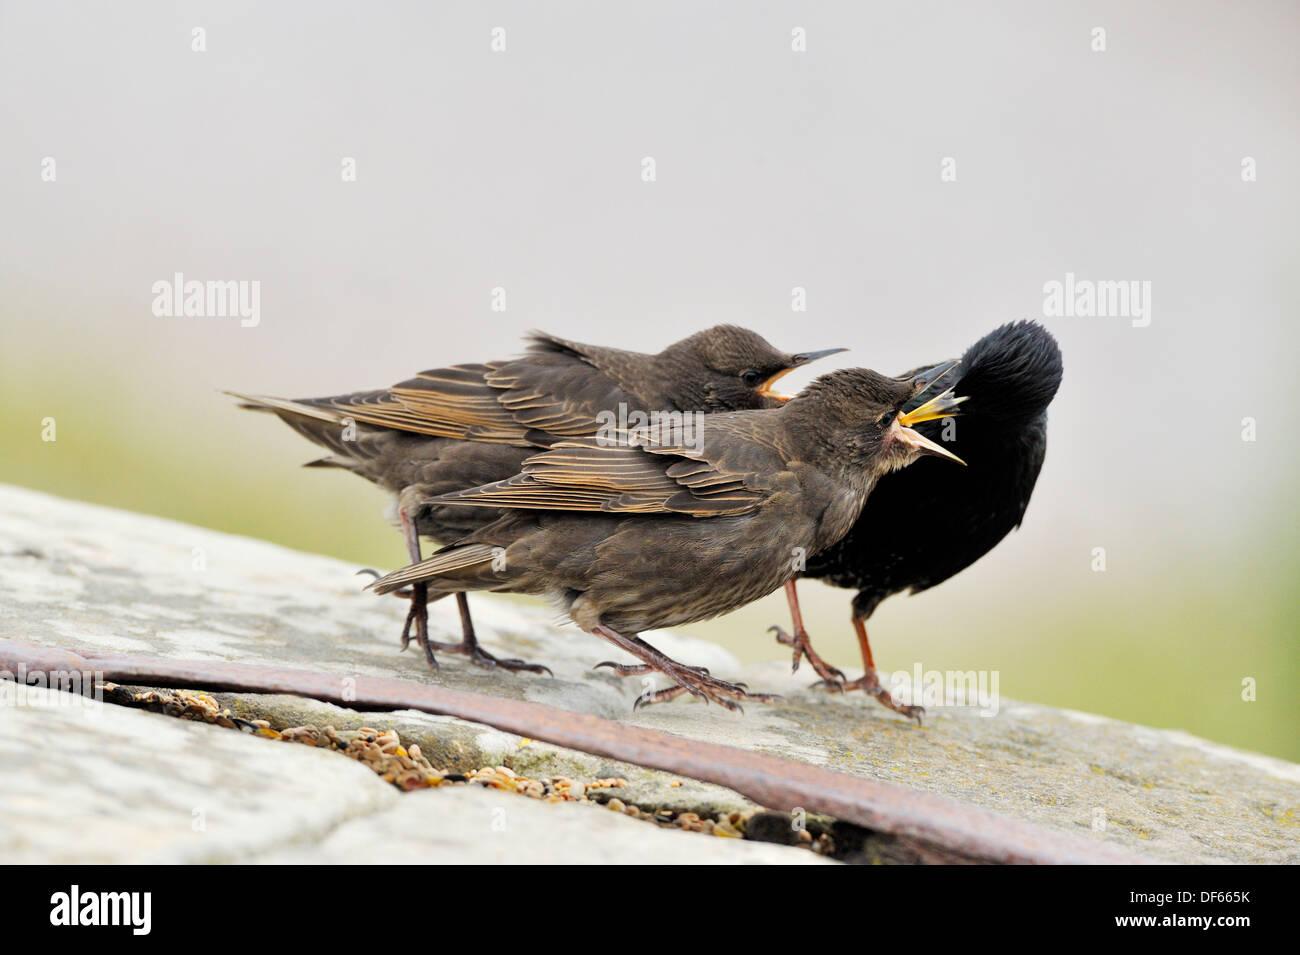 Starling - Juveniles being fed by parent Sturnus vulgaris - Stock Image